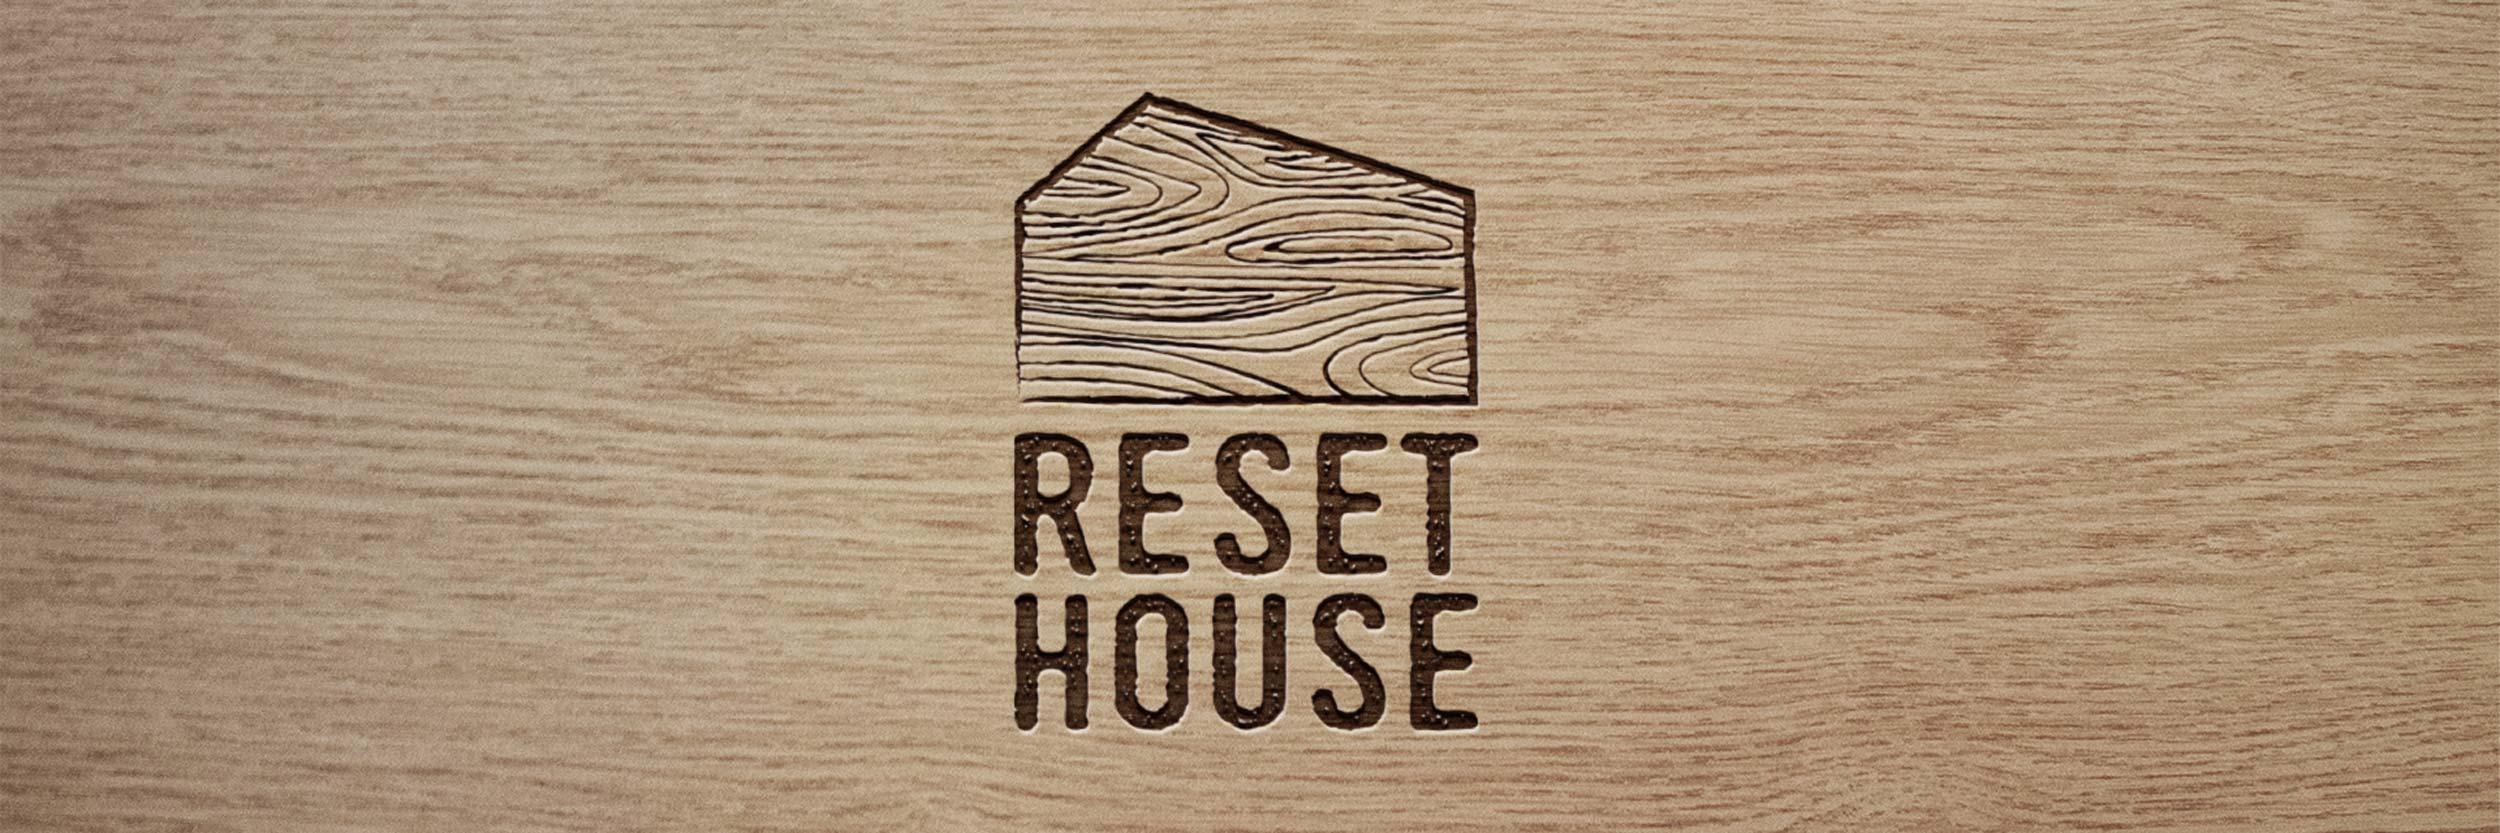 Reset House logo by GPU Design